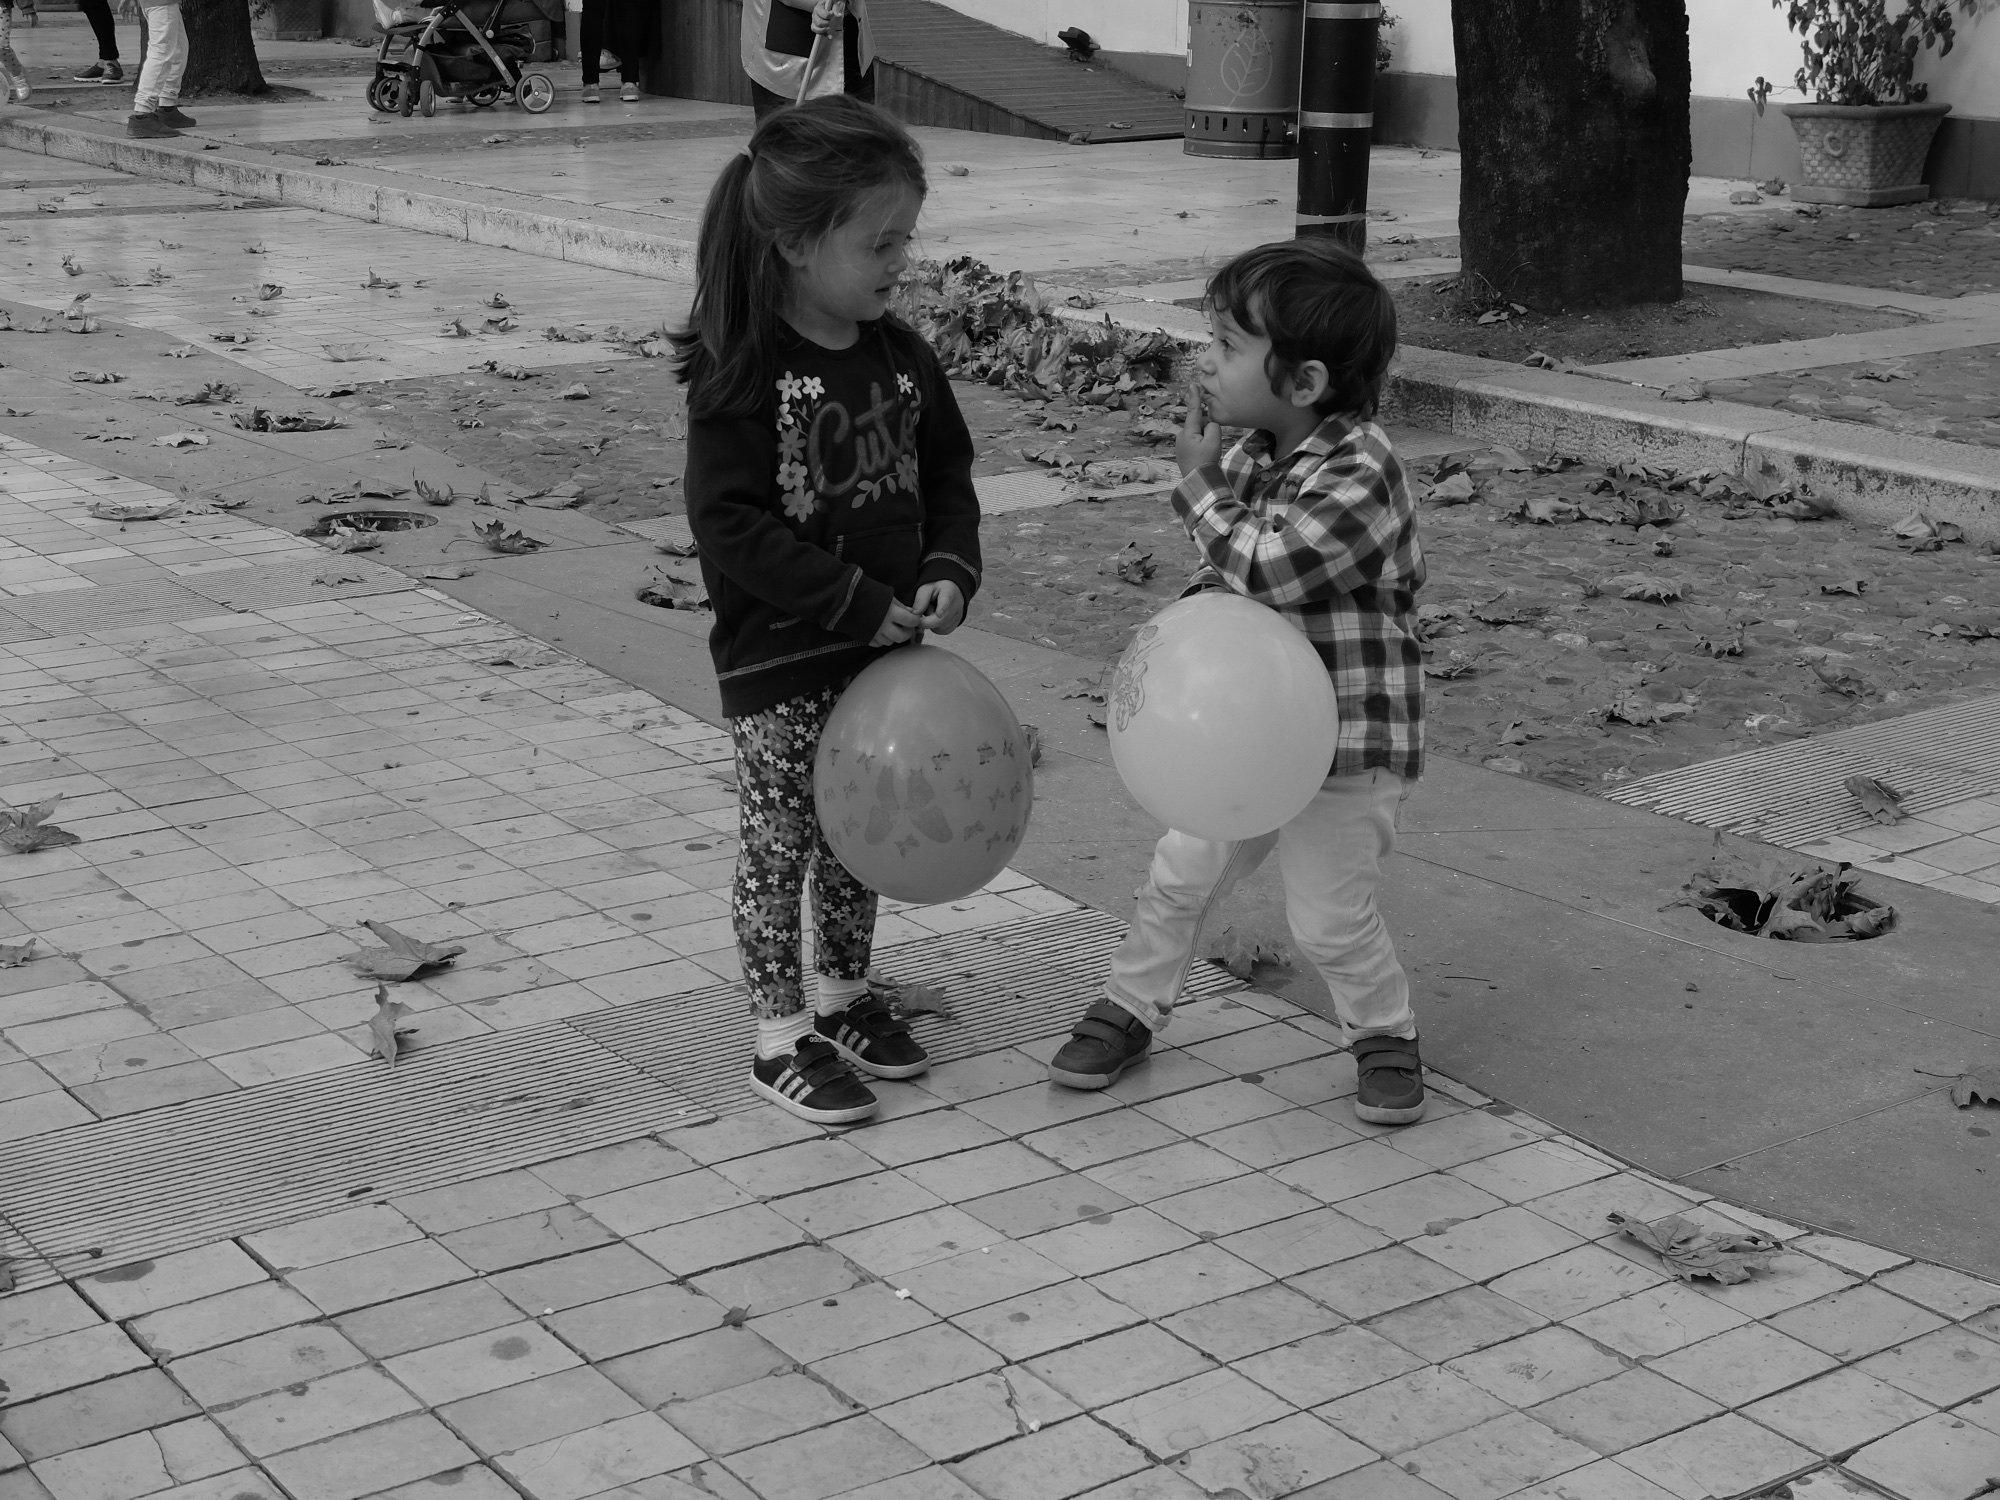 Mirush Bega, Tirana, 27 octobre 2019 (2)